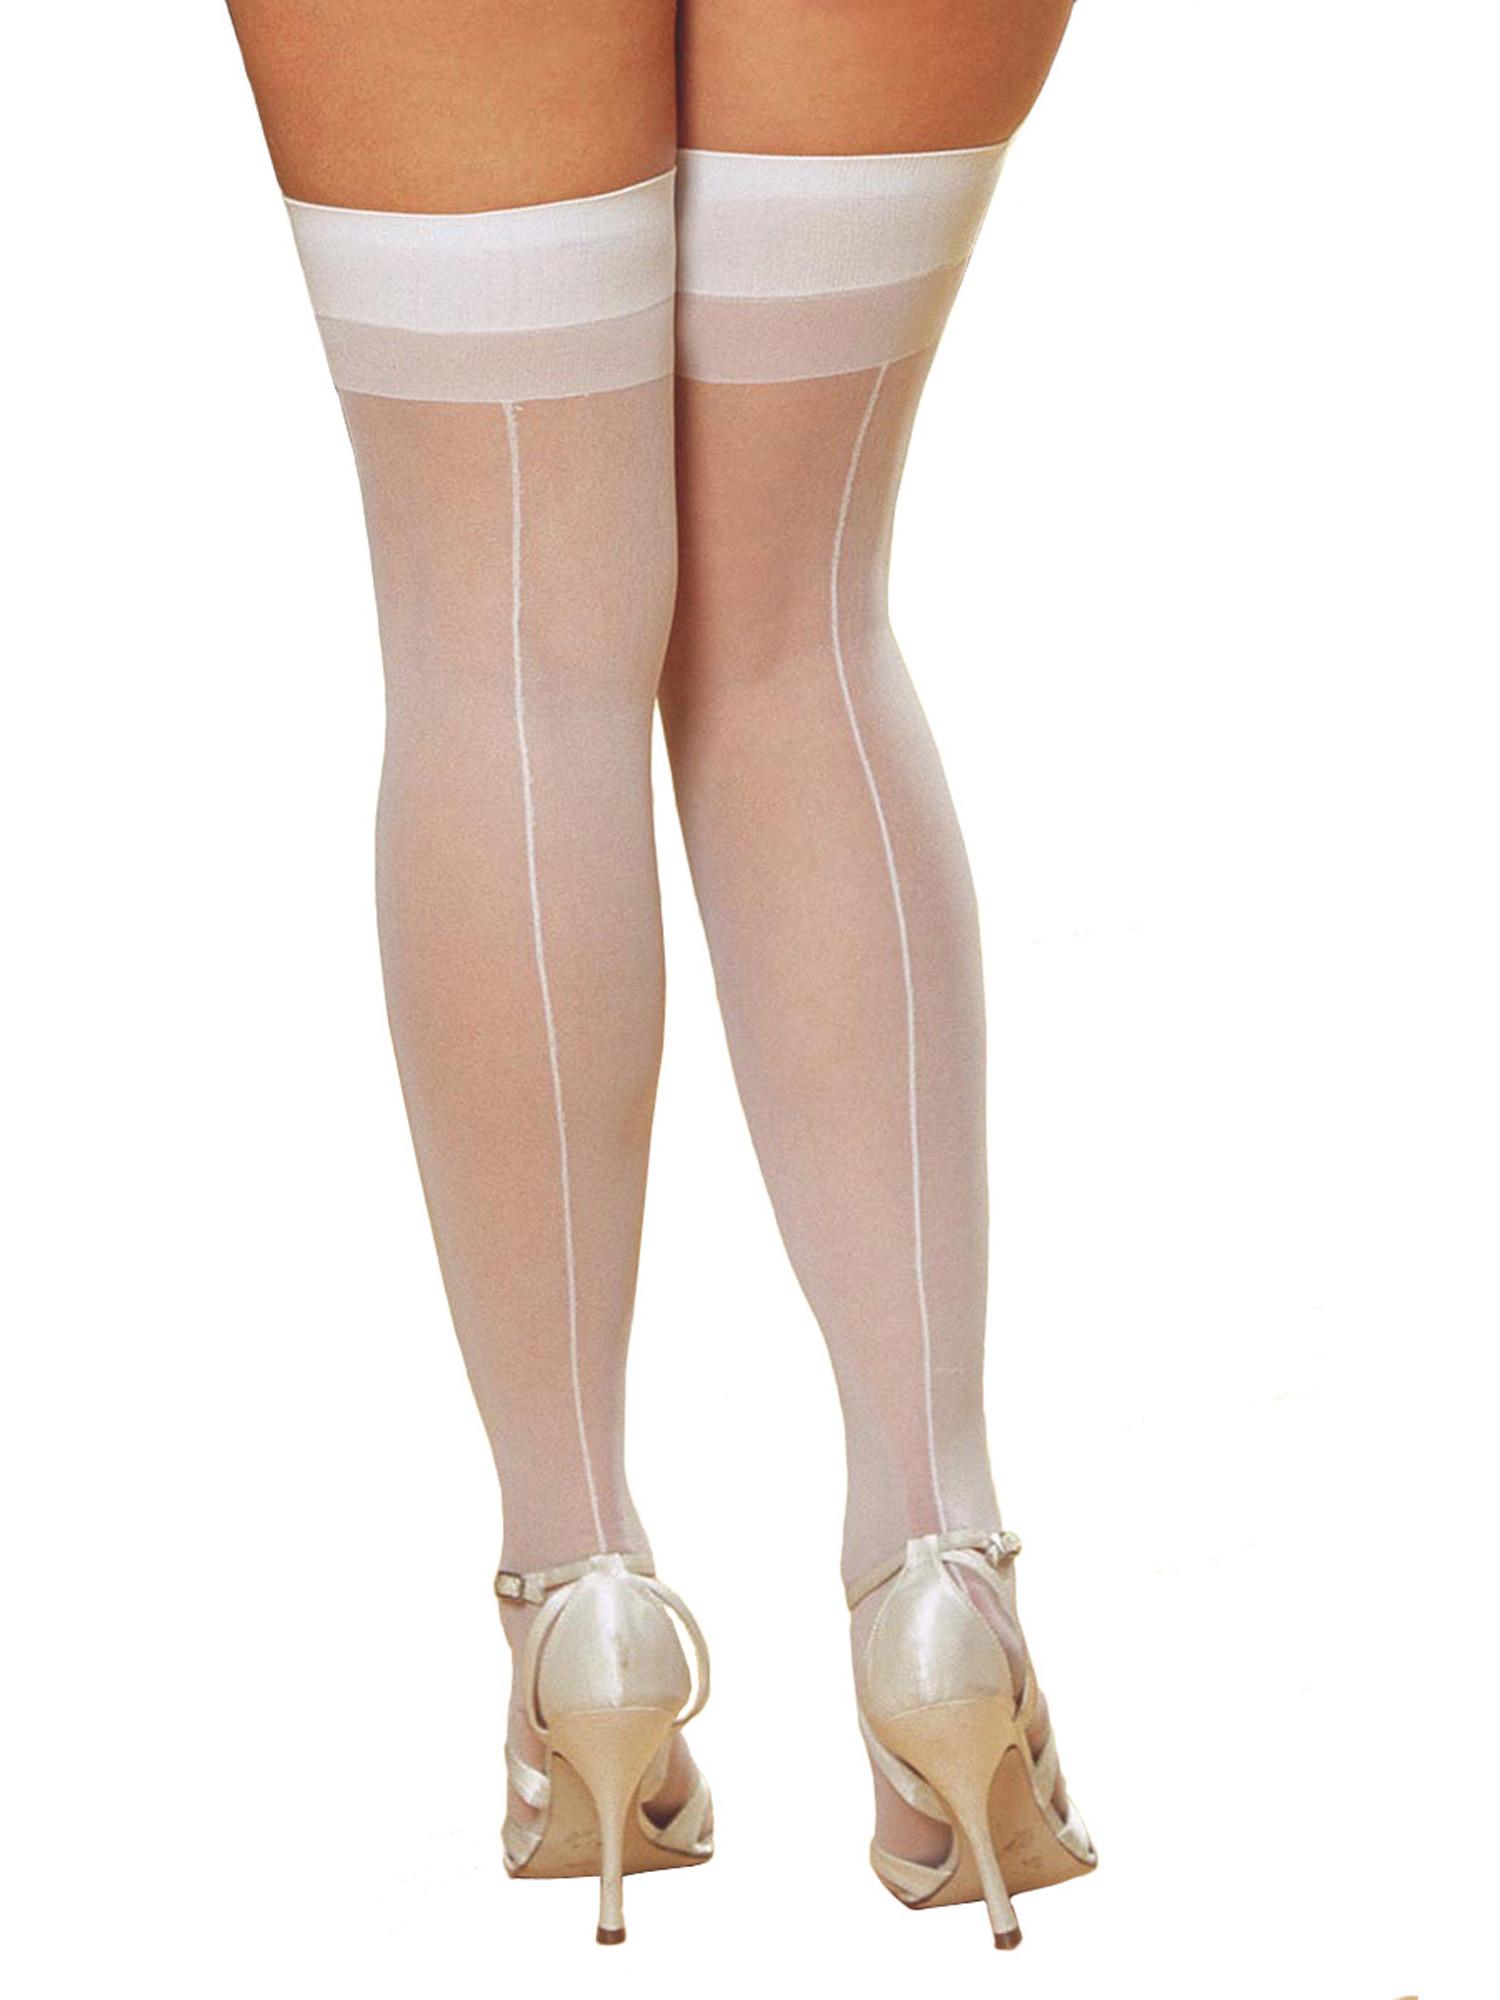 Audrey bitoni pantyhose